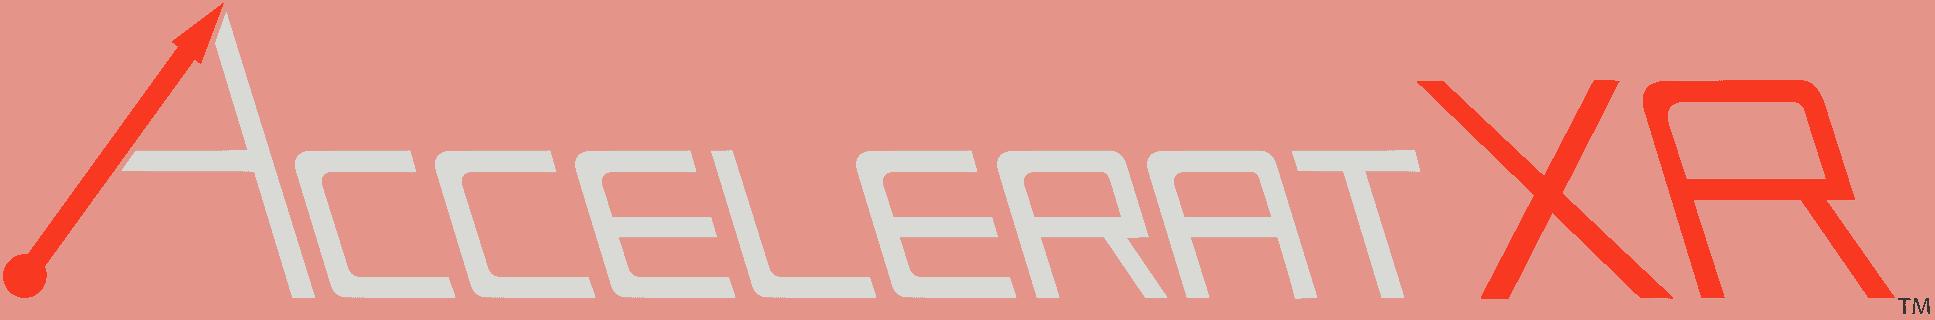 AcceleratXR